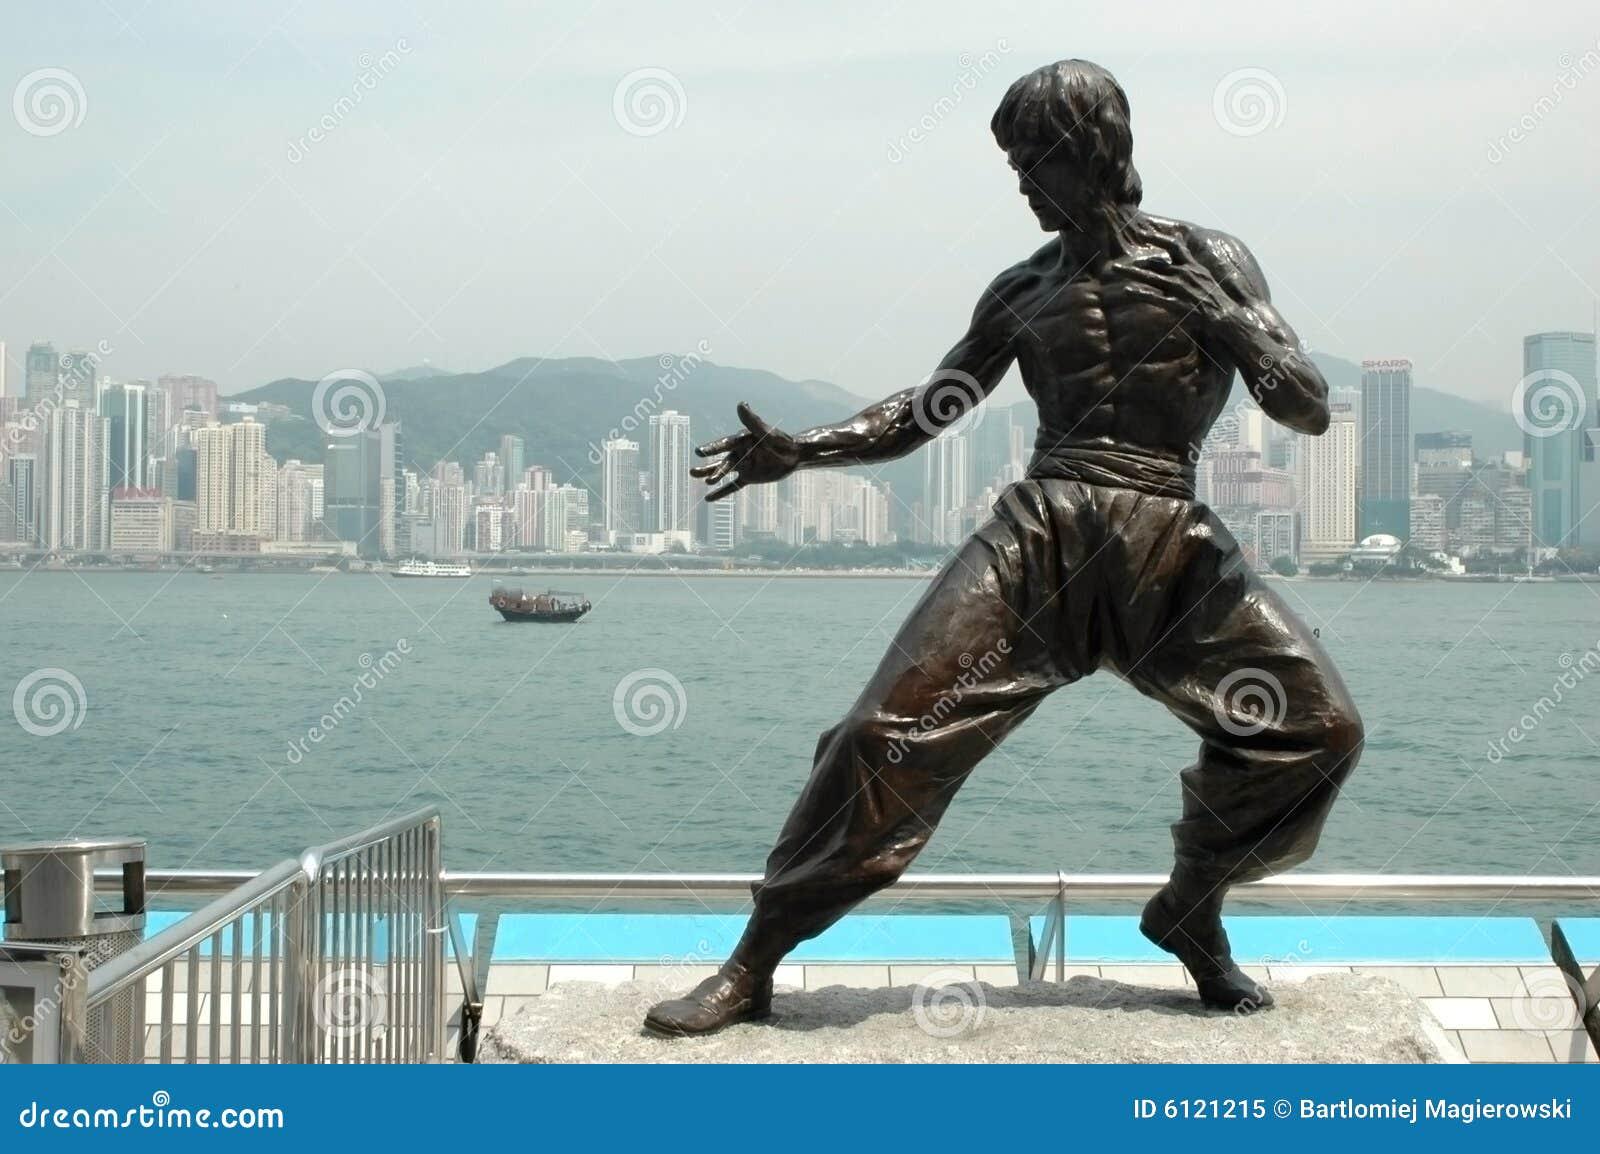 Kungfu Skulptur - Hong Kong